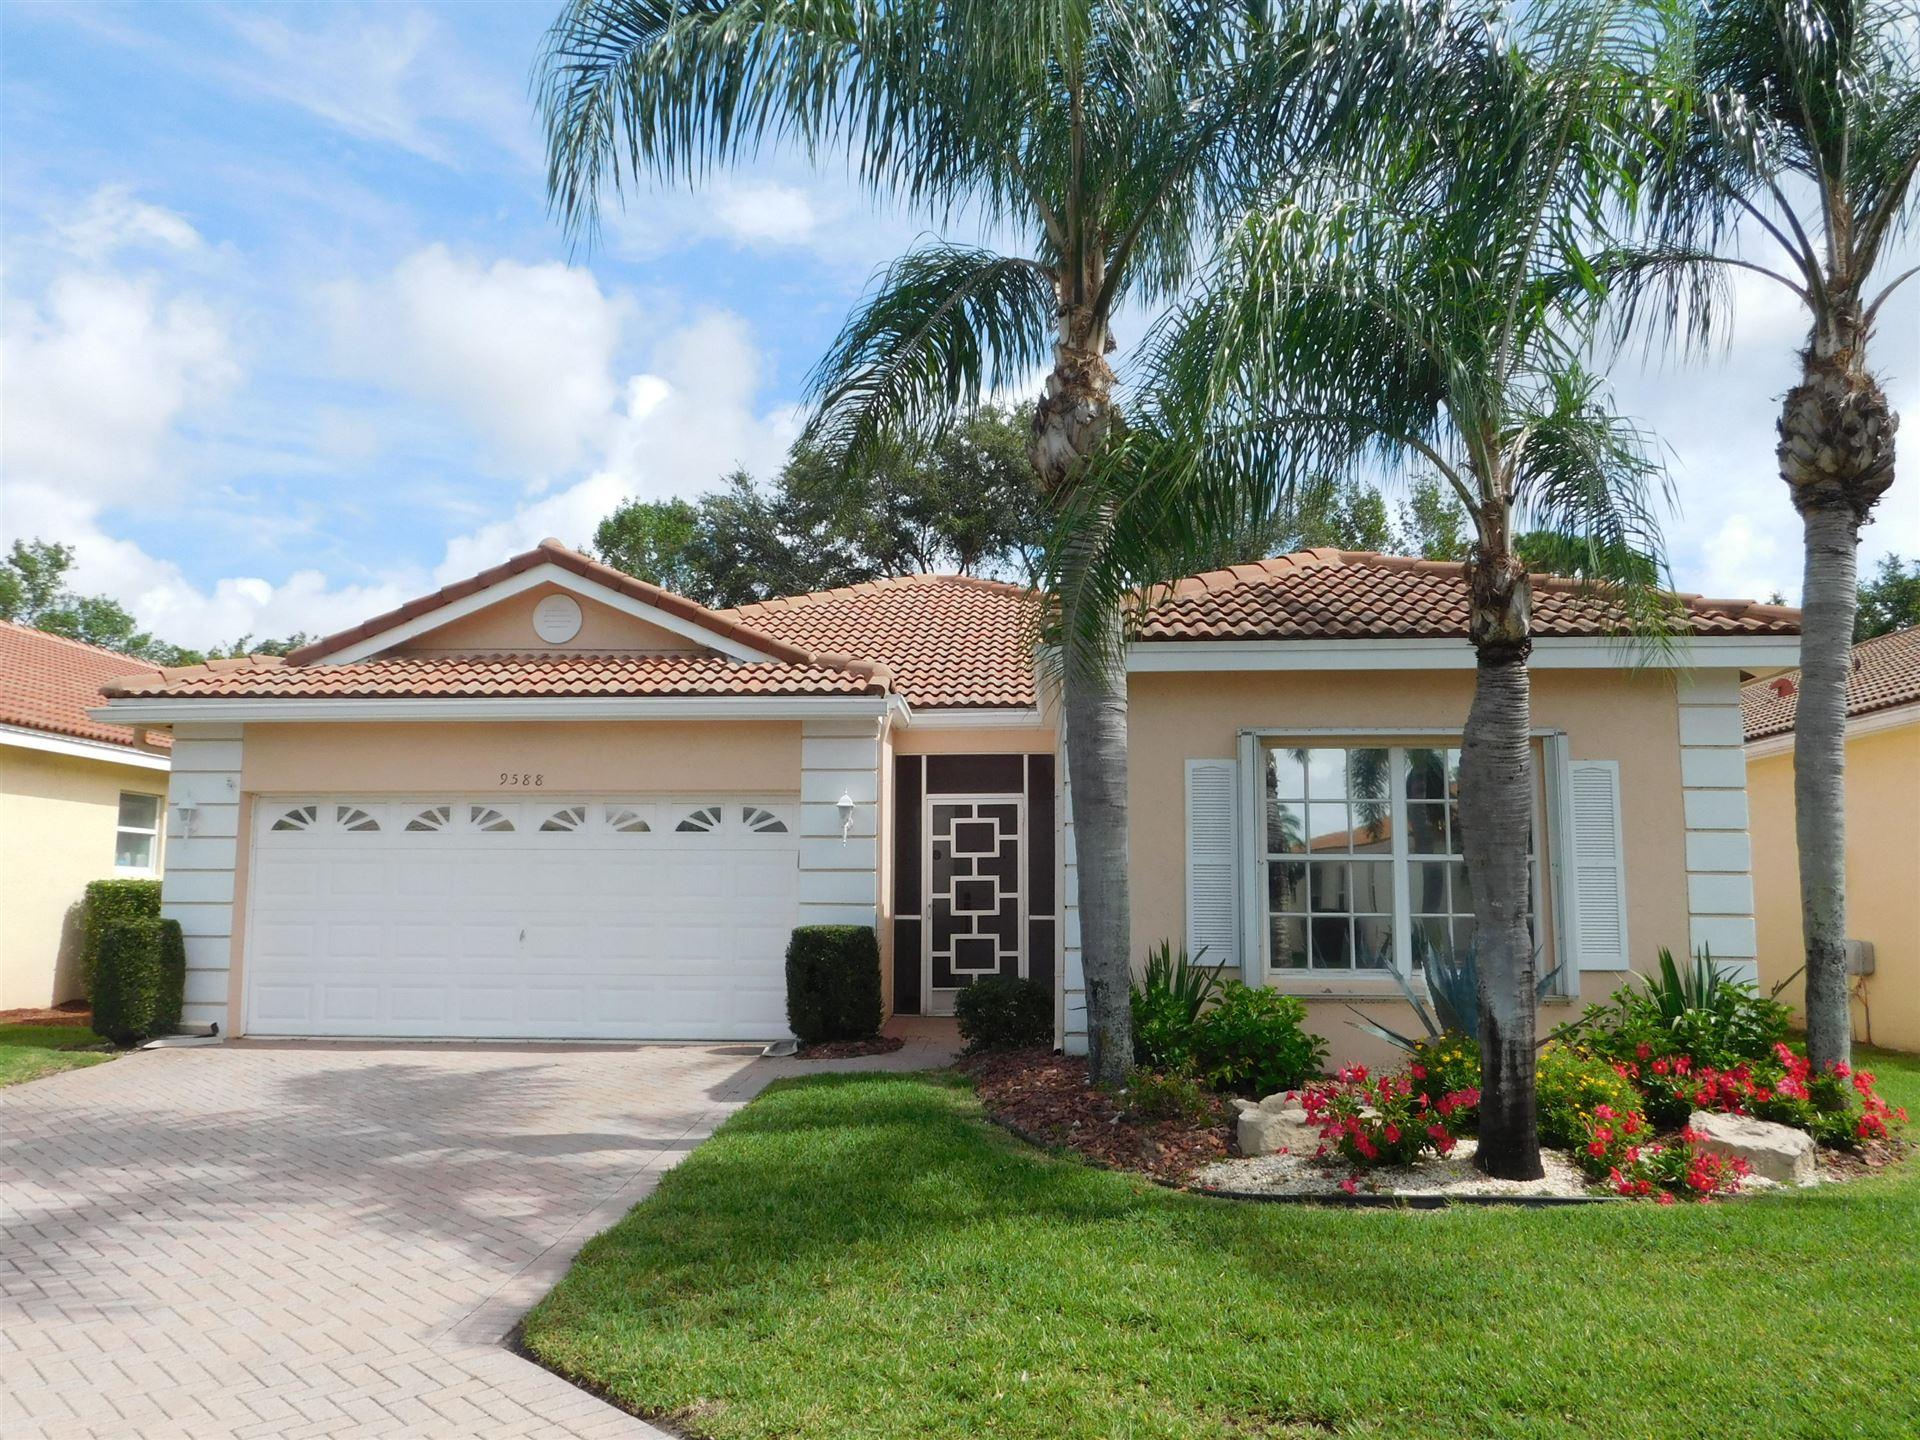 9588 Honeybell Circle, Boynton Beach, FL 33437 - #: RX-10632634